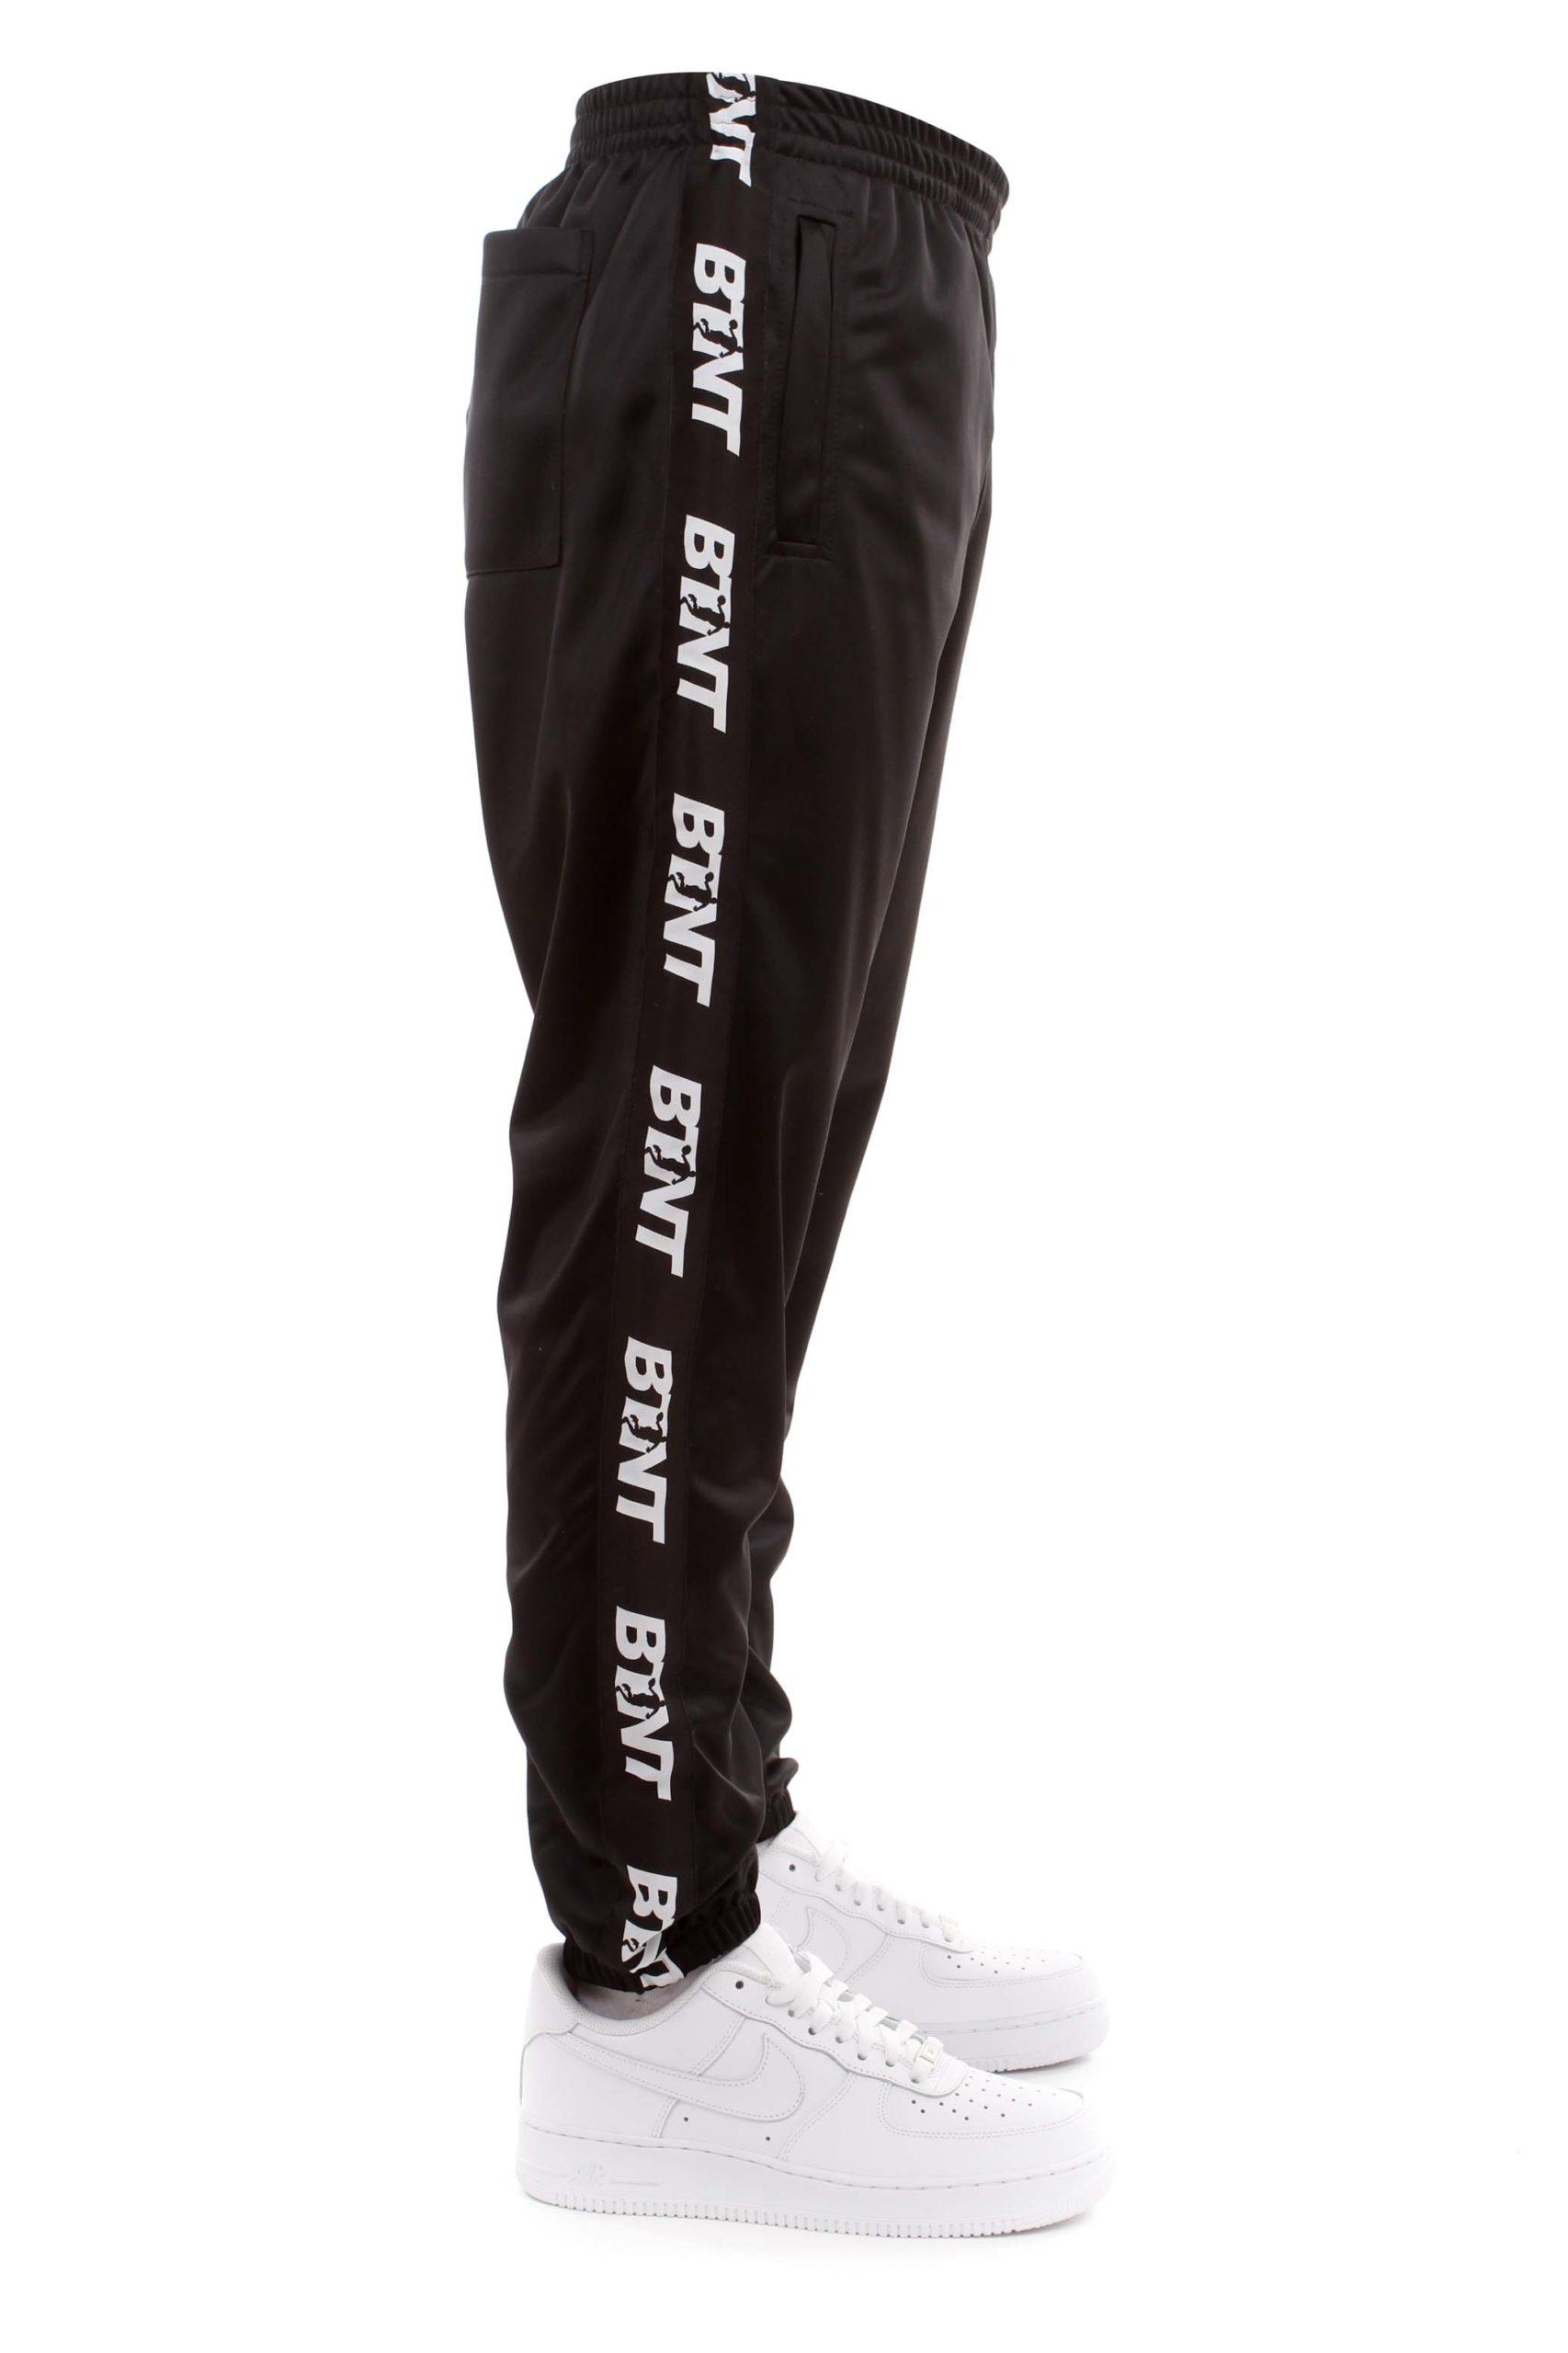 Pantalone butnot acetato black/white